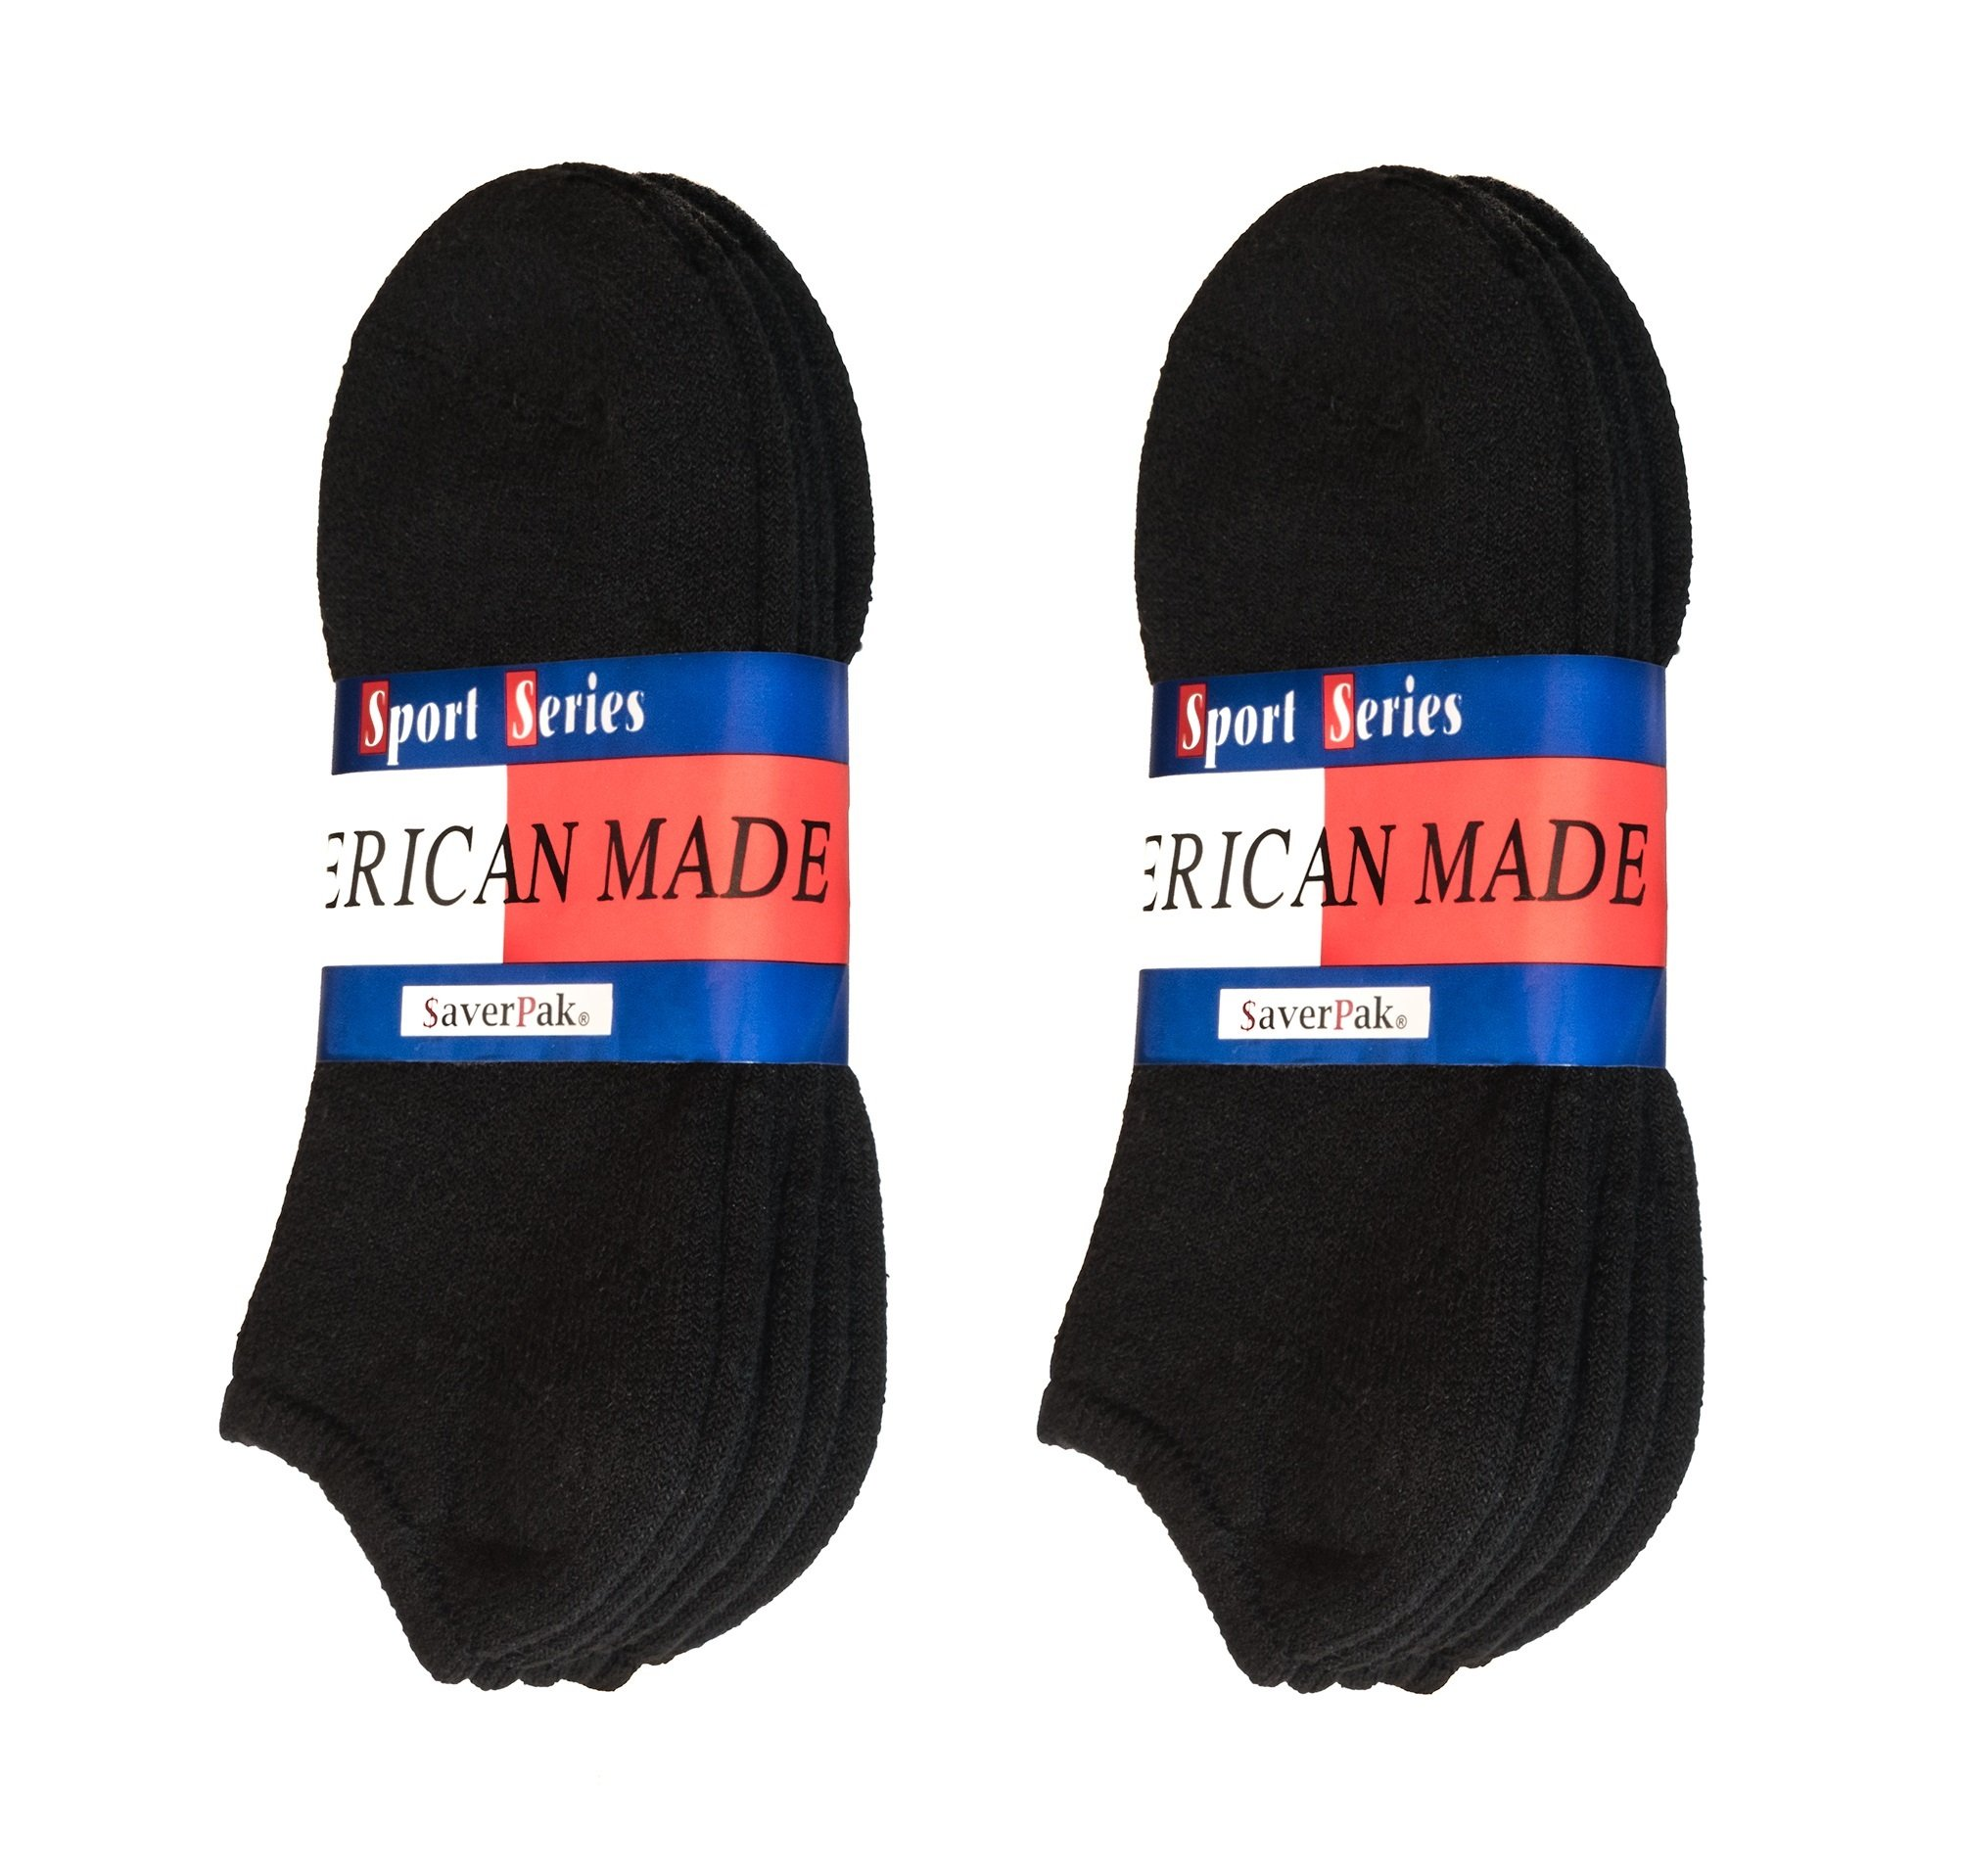 $averPak American Made Cotton Blend No Show Black Athletic Socks (3 Pair Per Band)